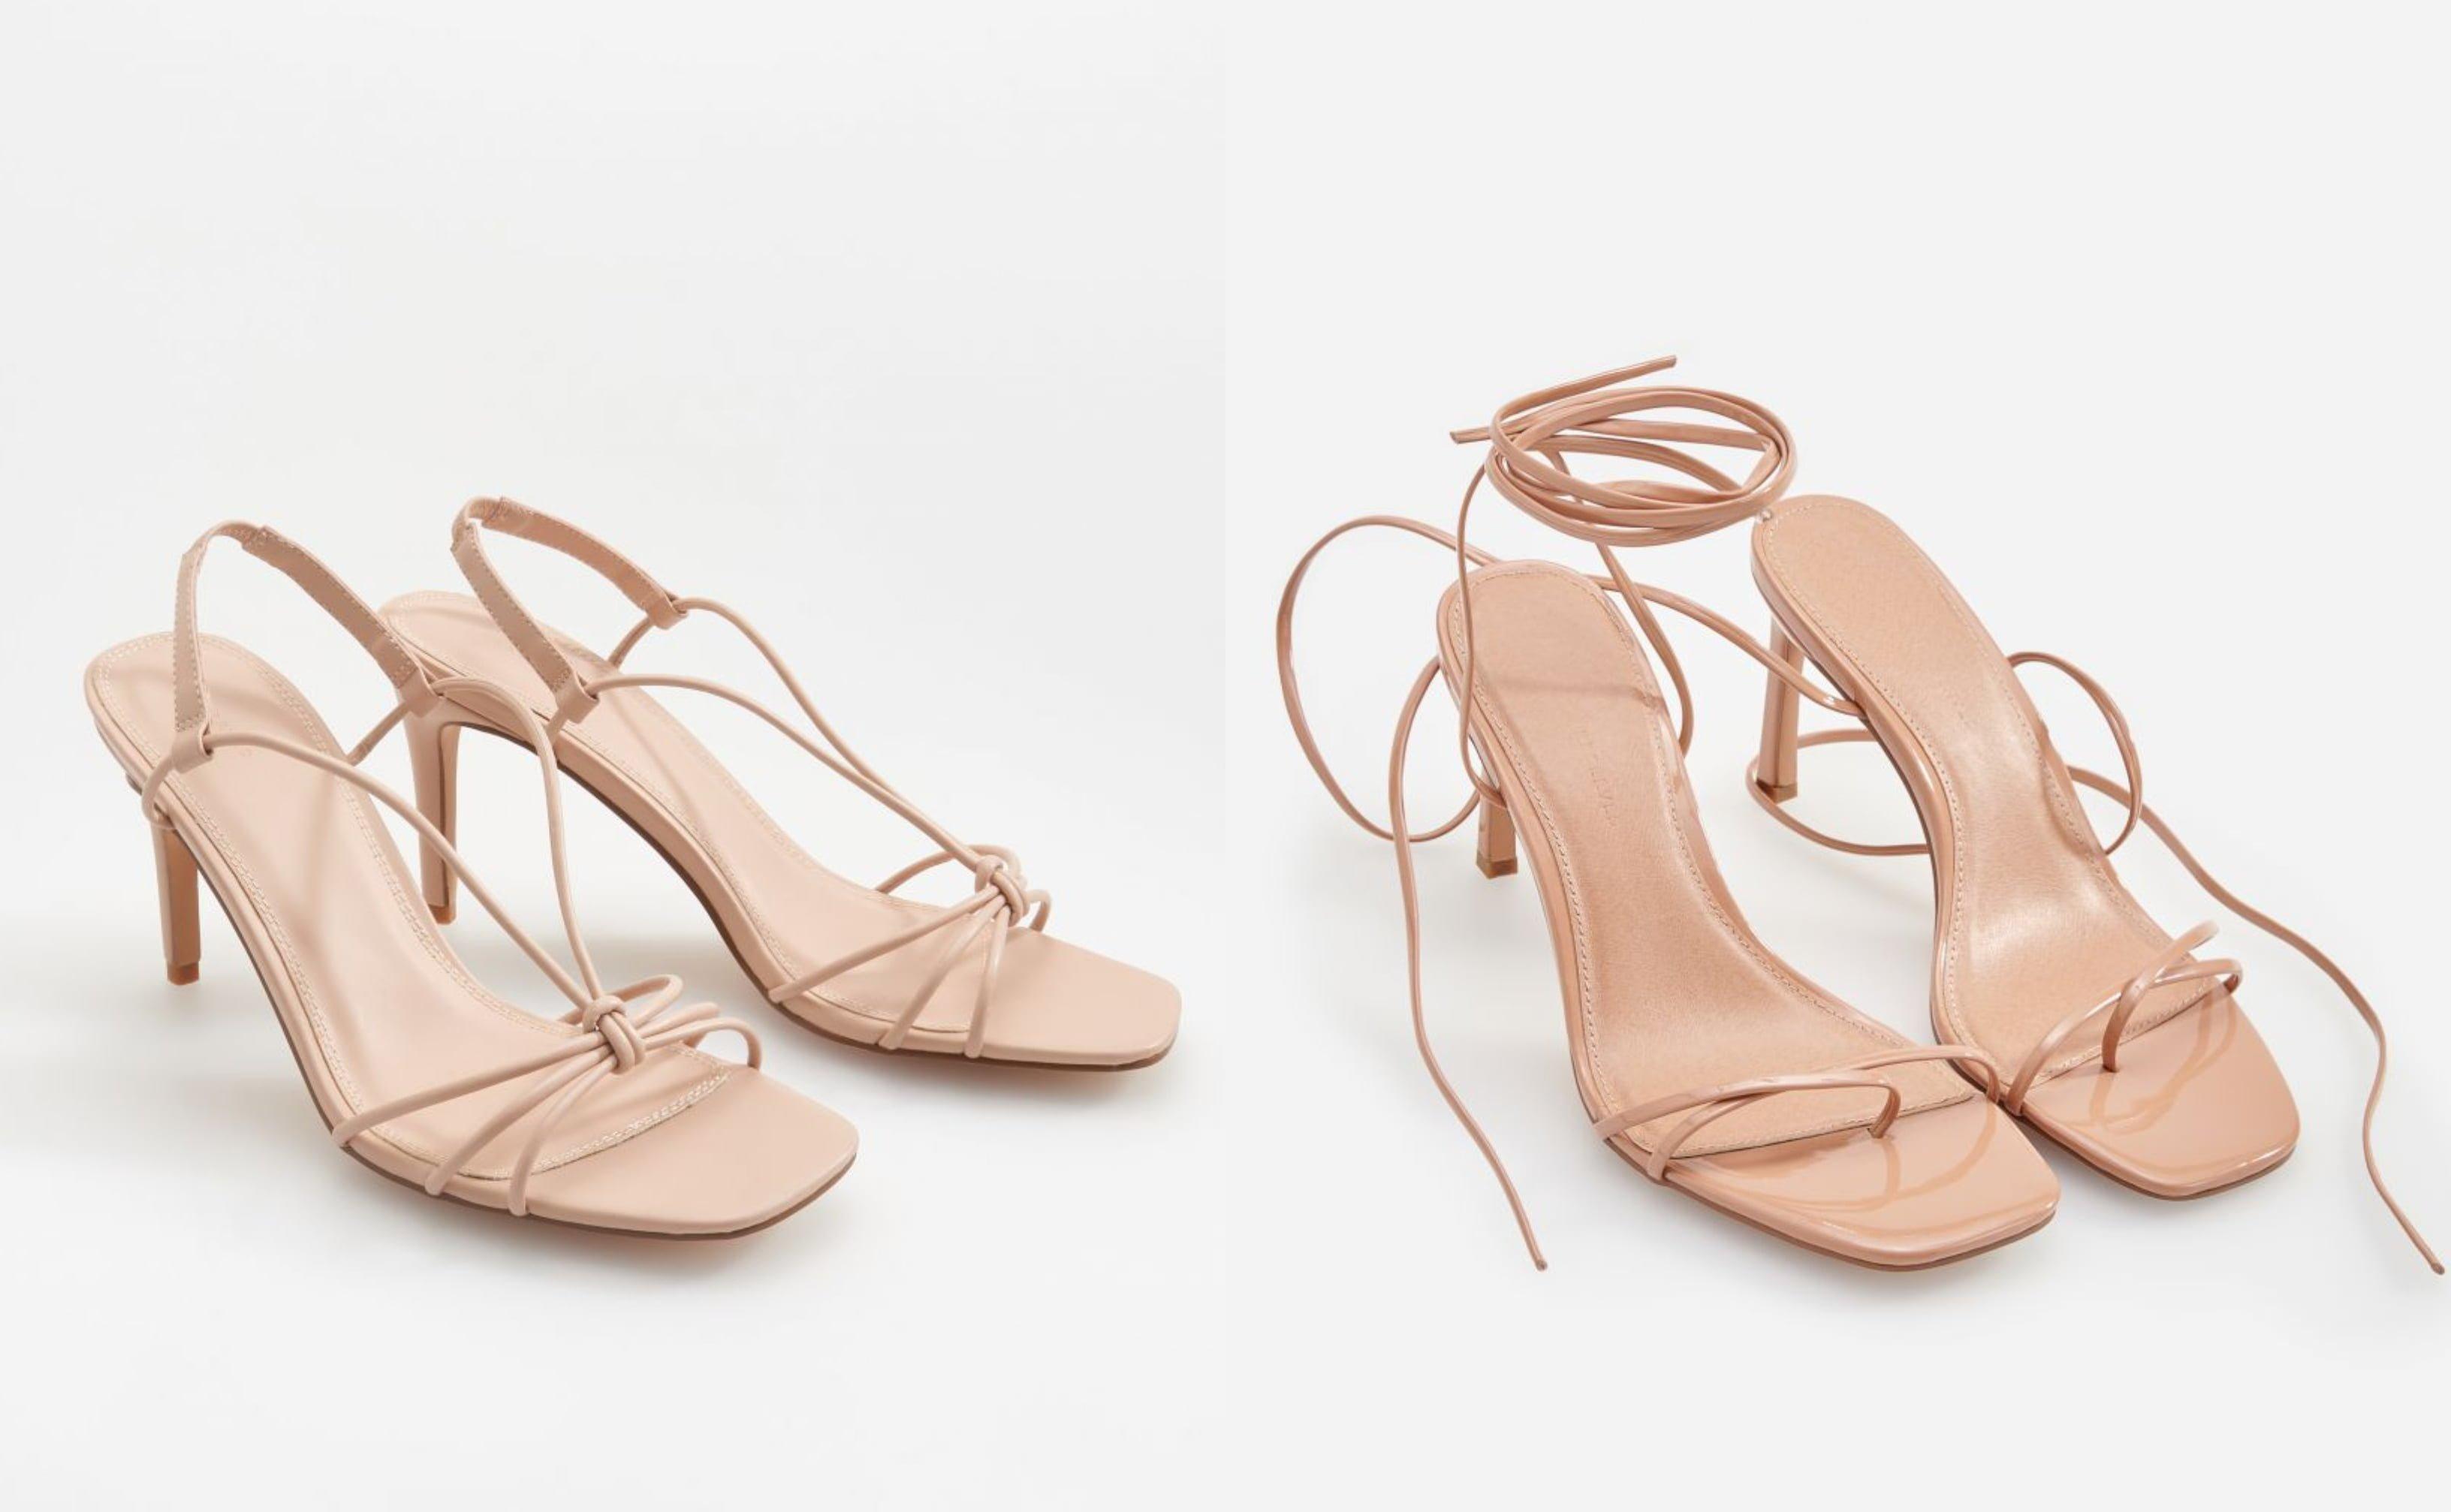 Najljepše nude sandale iz aktualnih kolekcija high street brendova